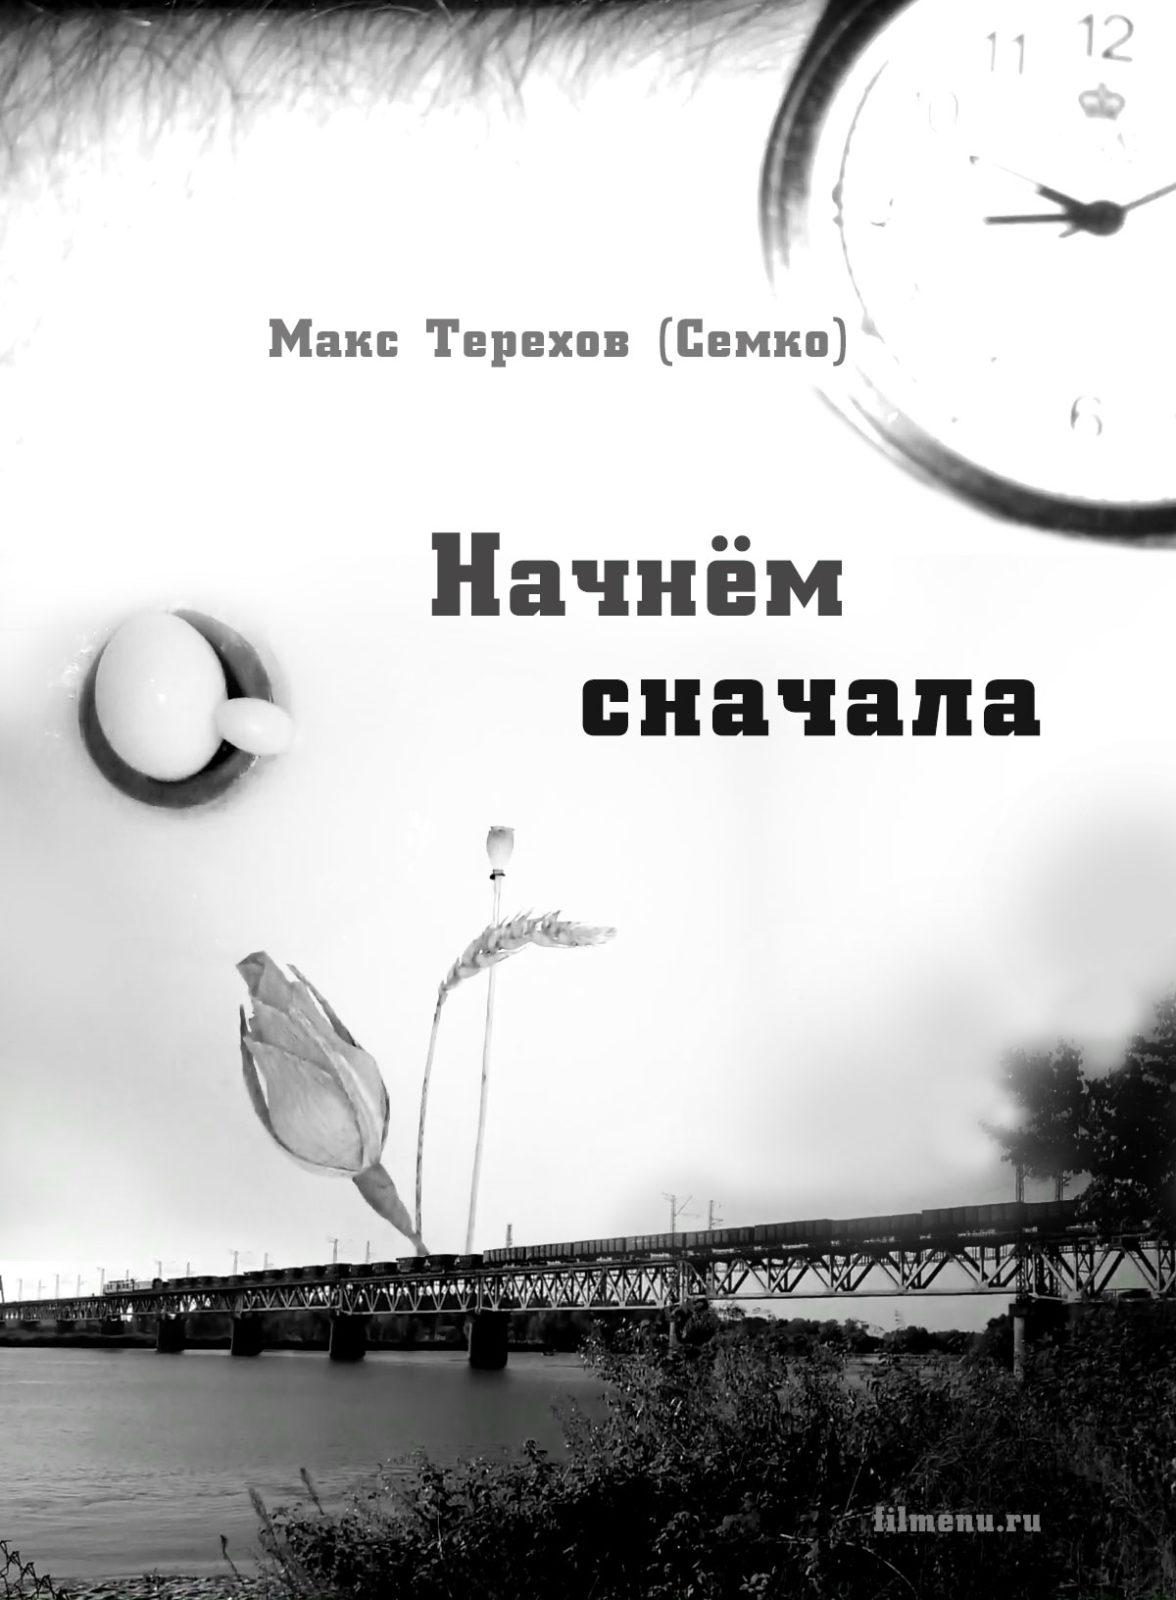 Начнём сначала (2014 Макс Терехов)